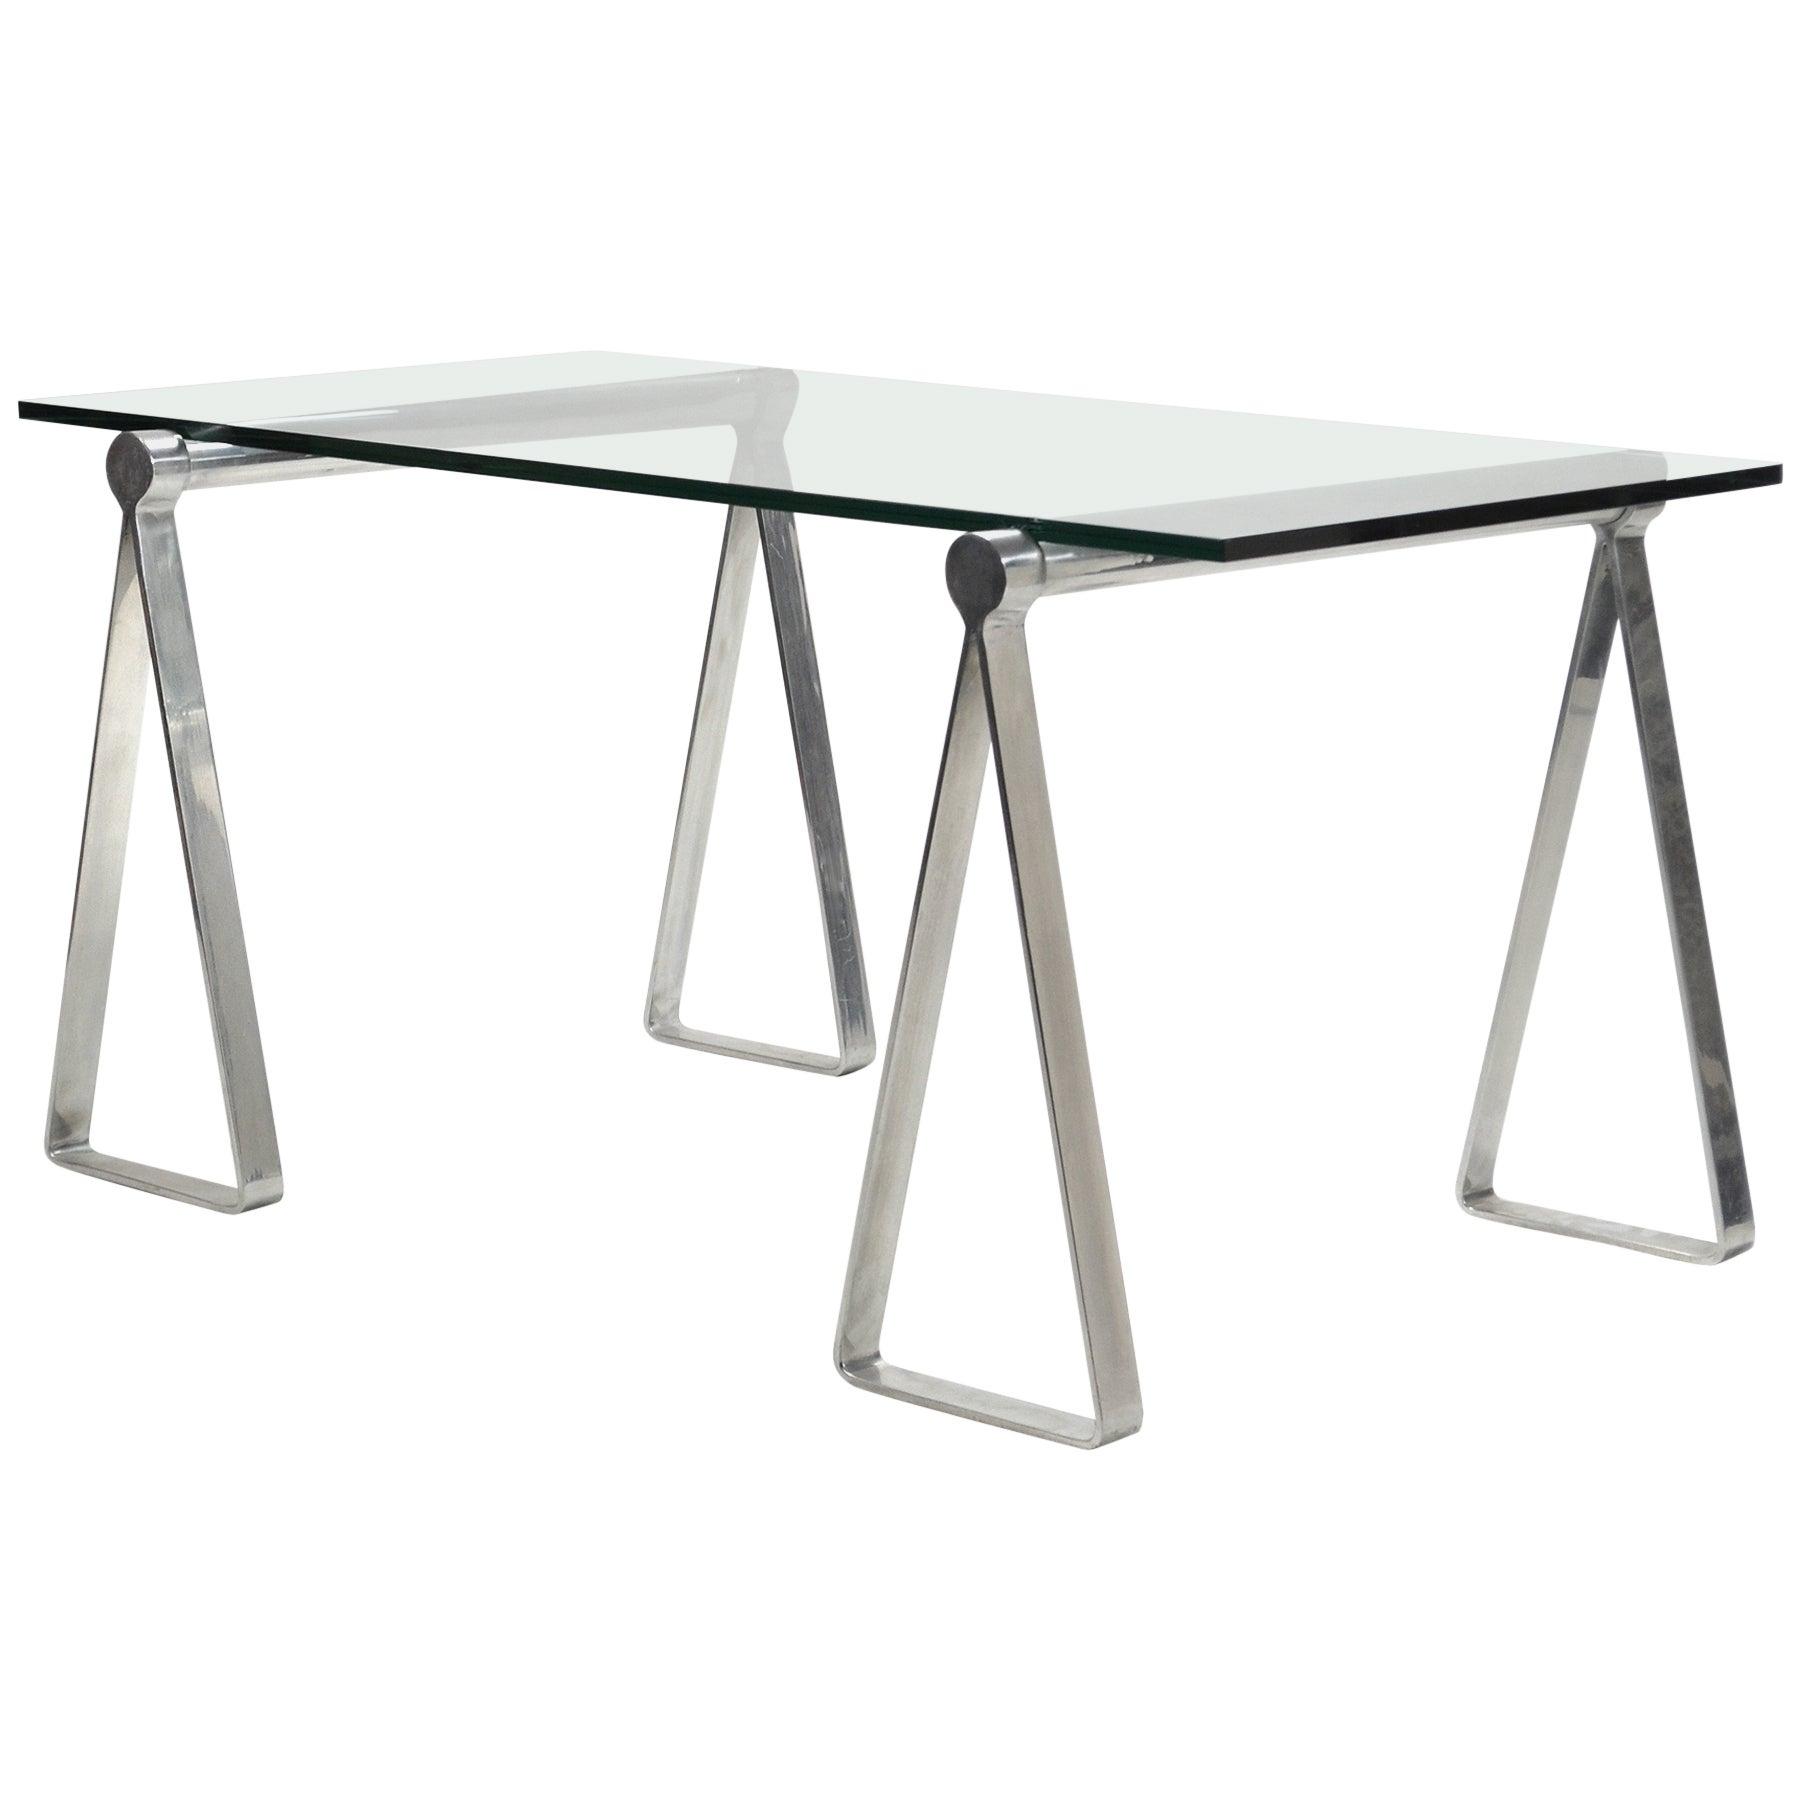 "1970s Aluminum ""Sawhorse"" Table or Desk"